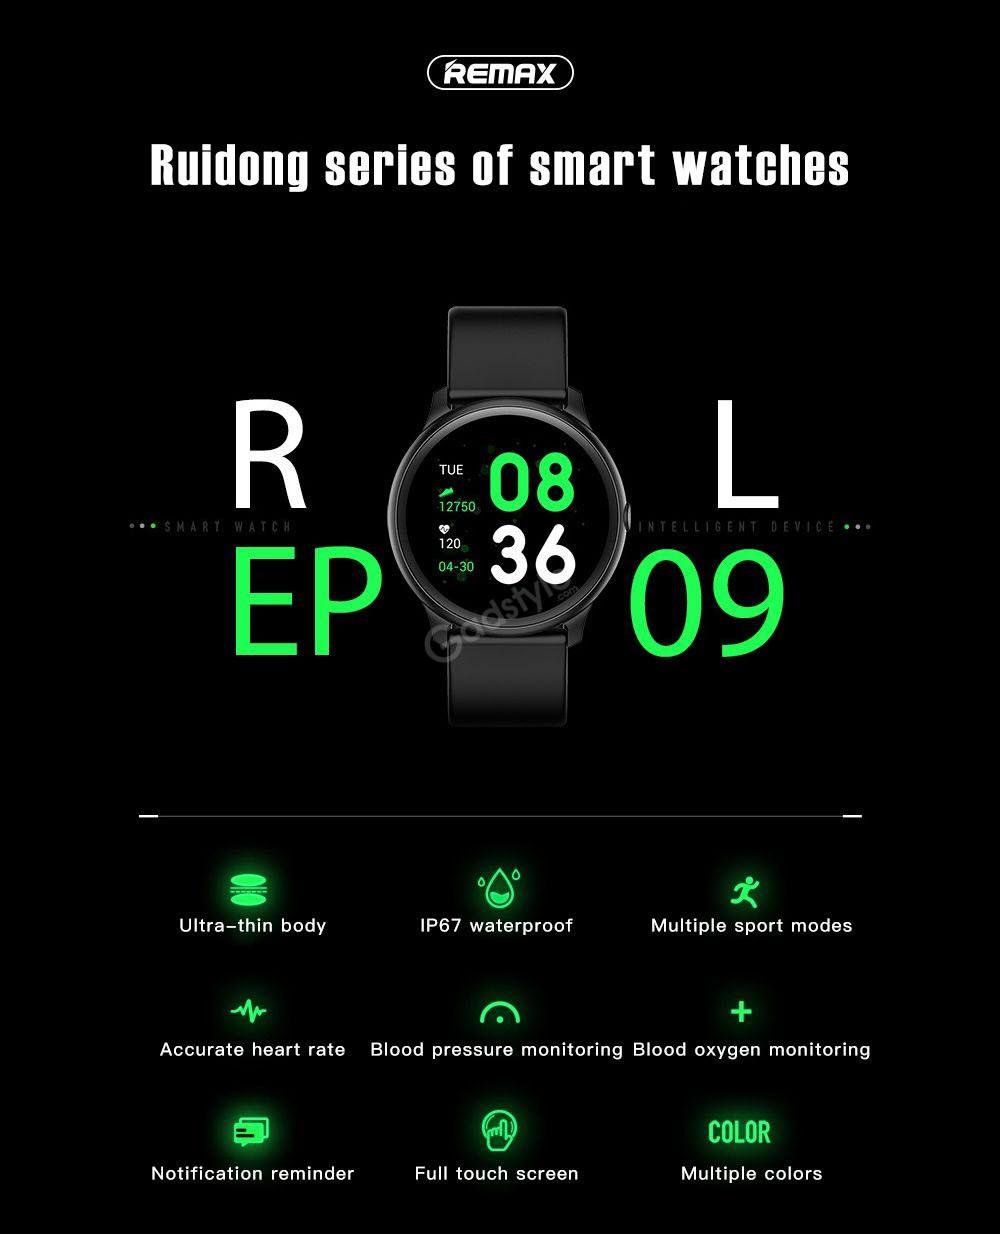 Remax Rl Ep09 Smart Watch (7)